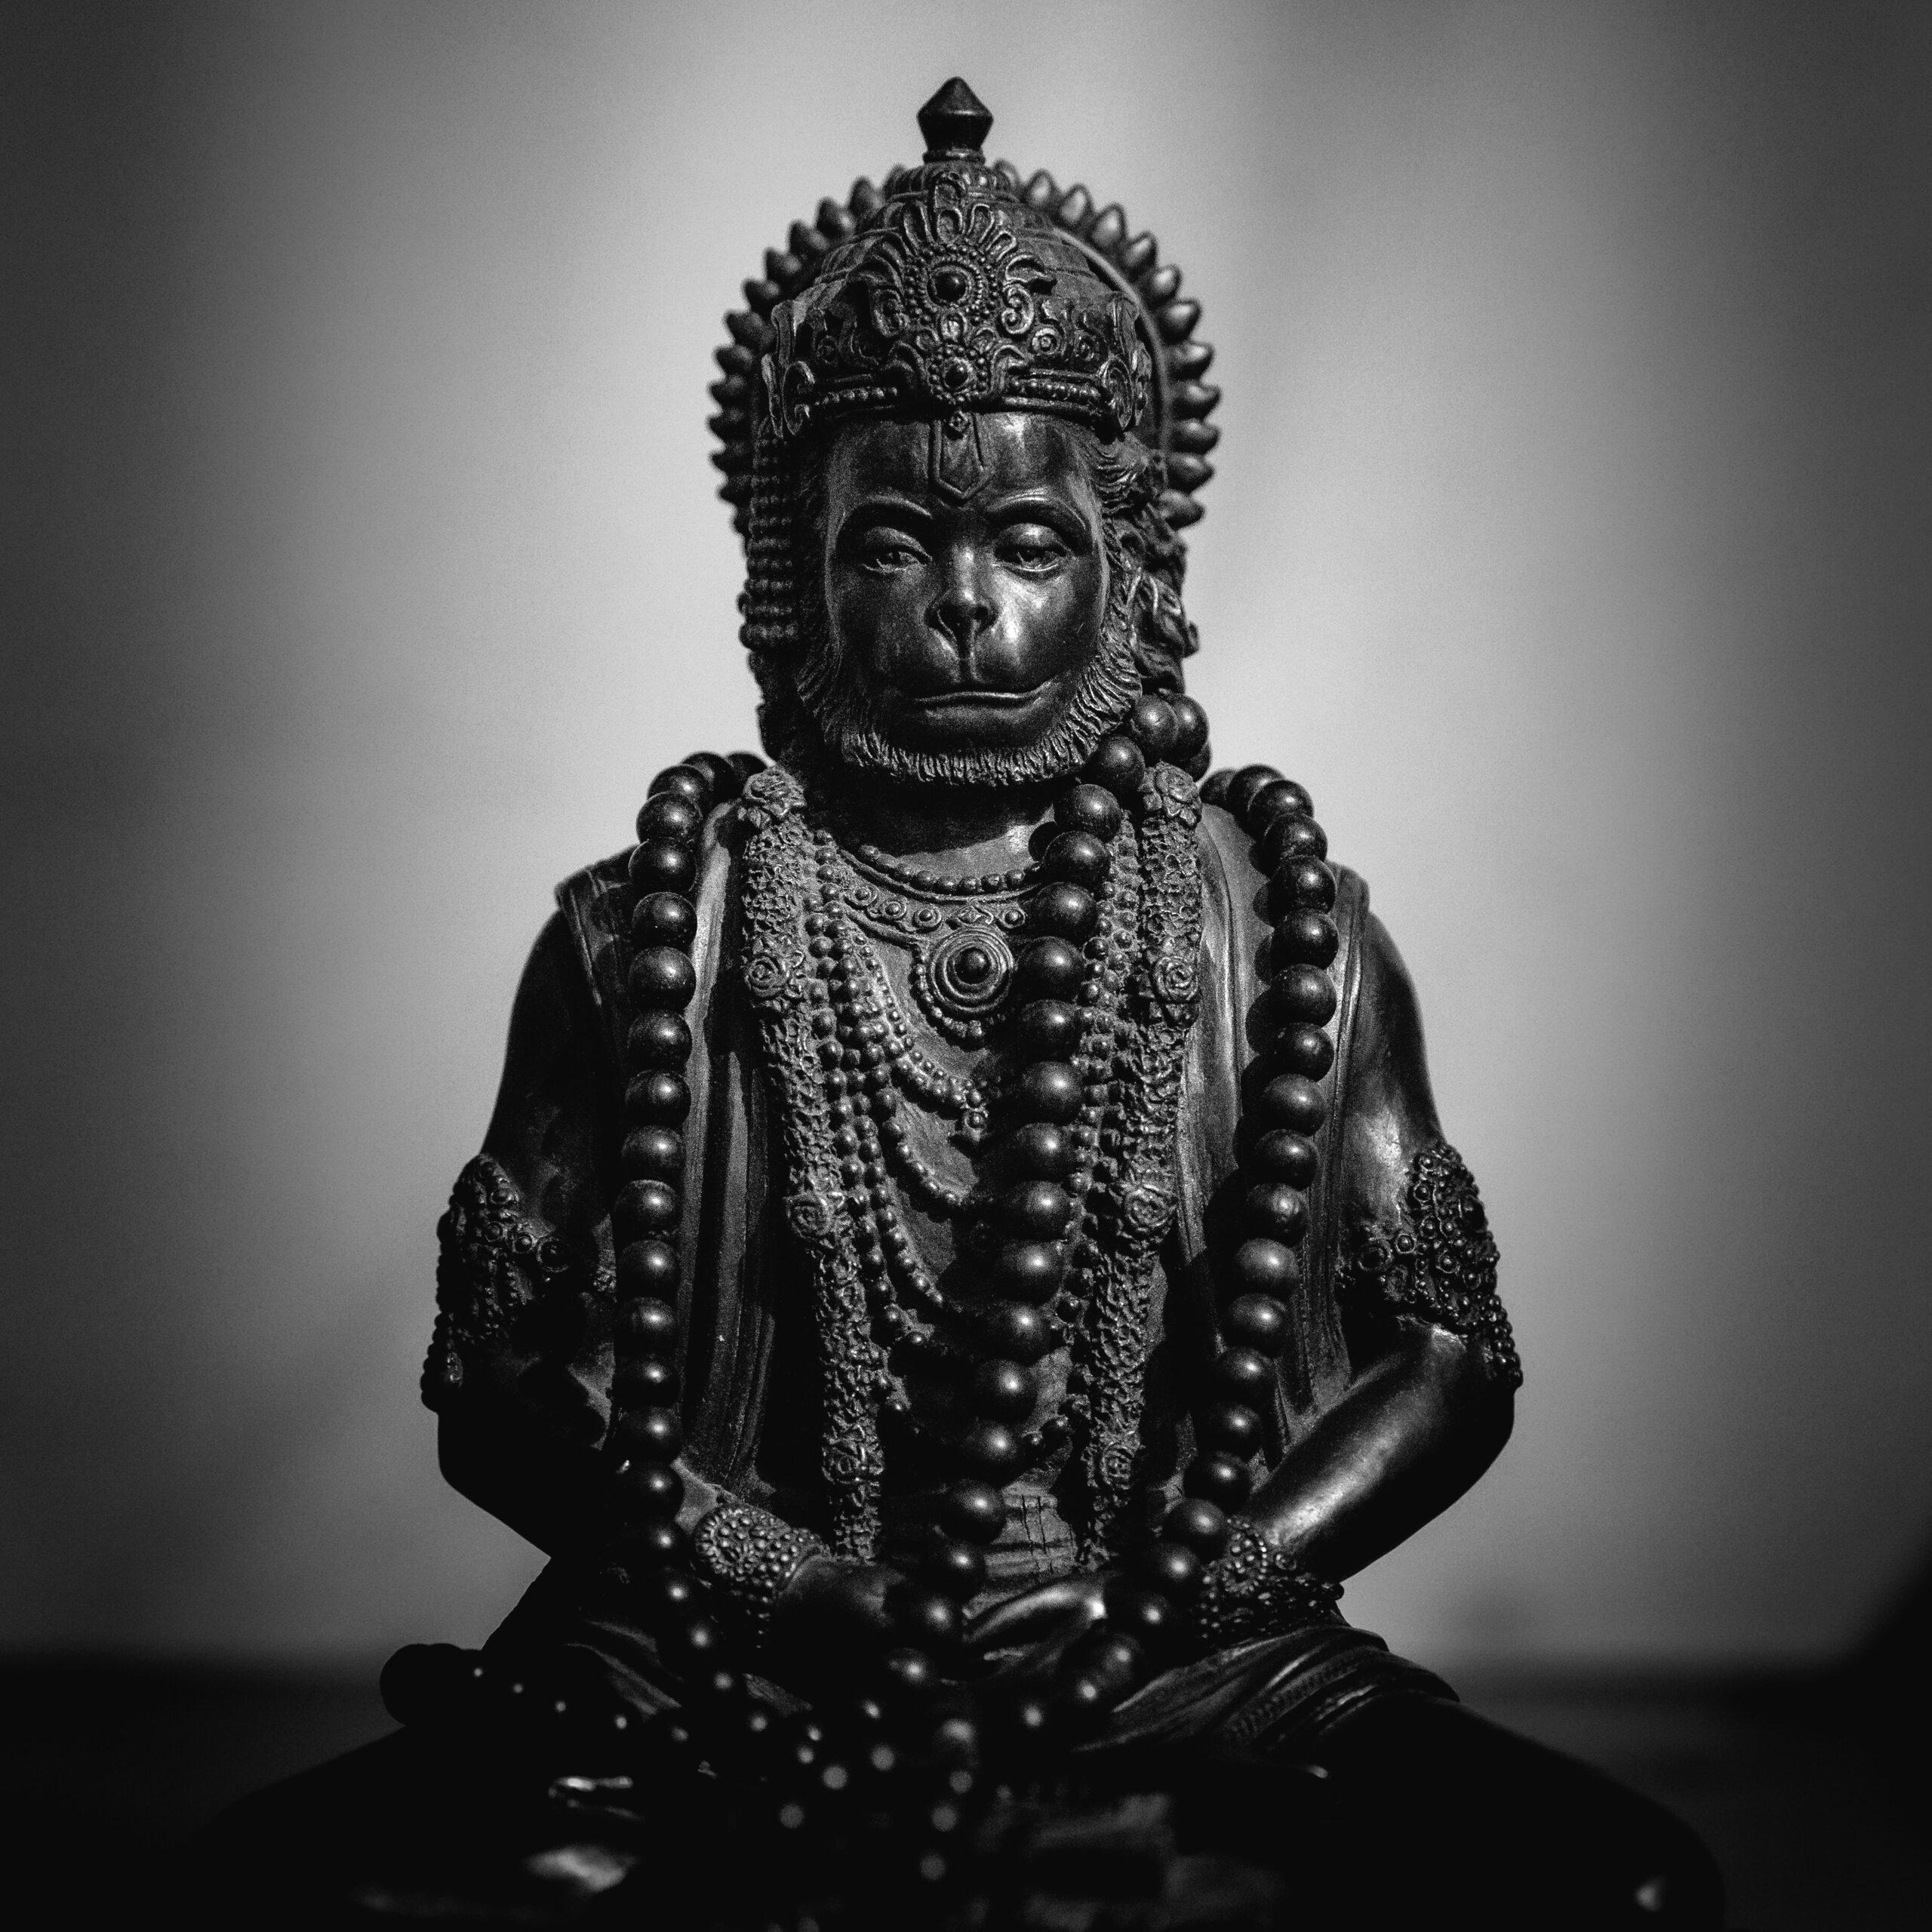 Hanuman bronze statue B&W image bt Tester Tyvg Unsplash